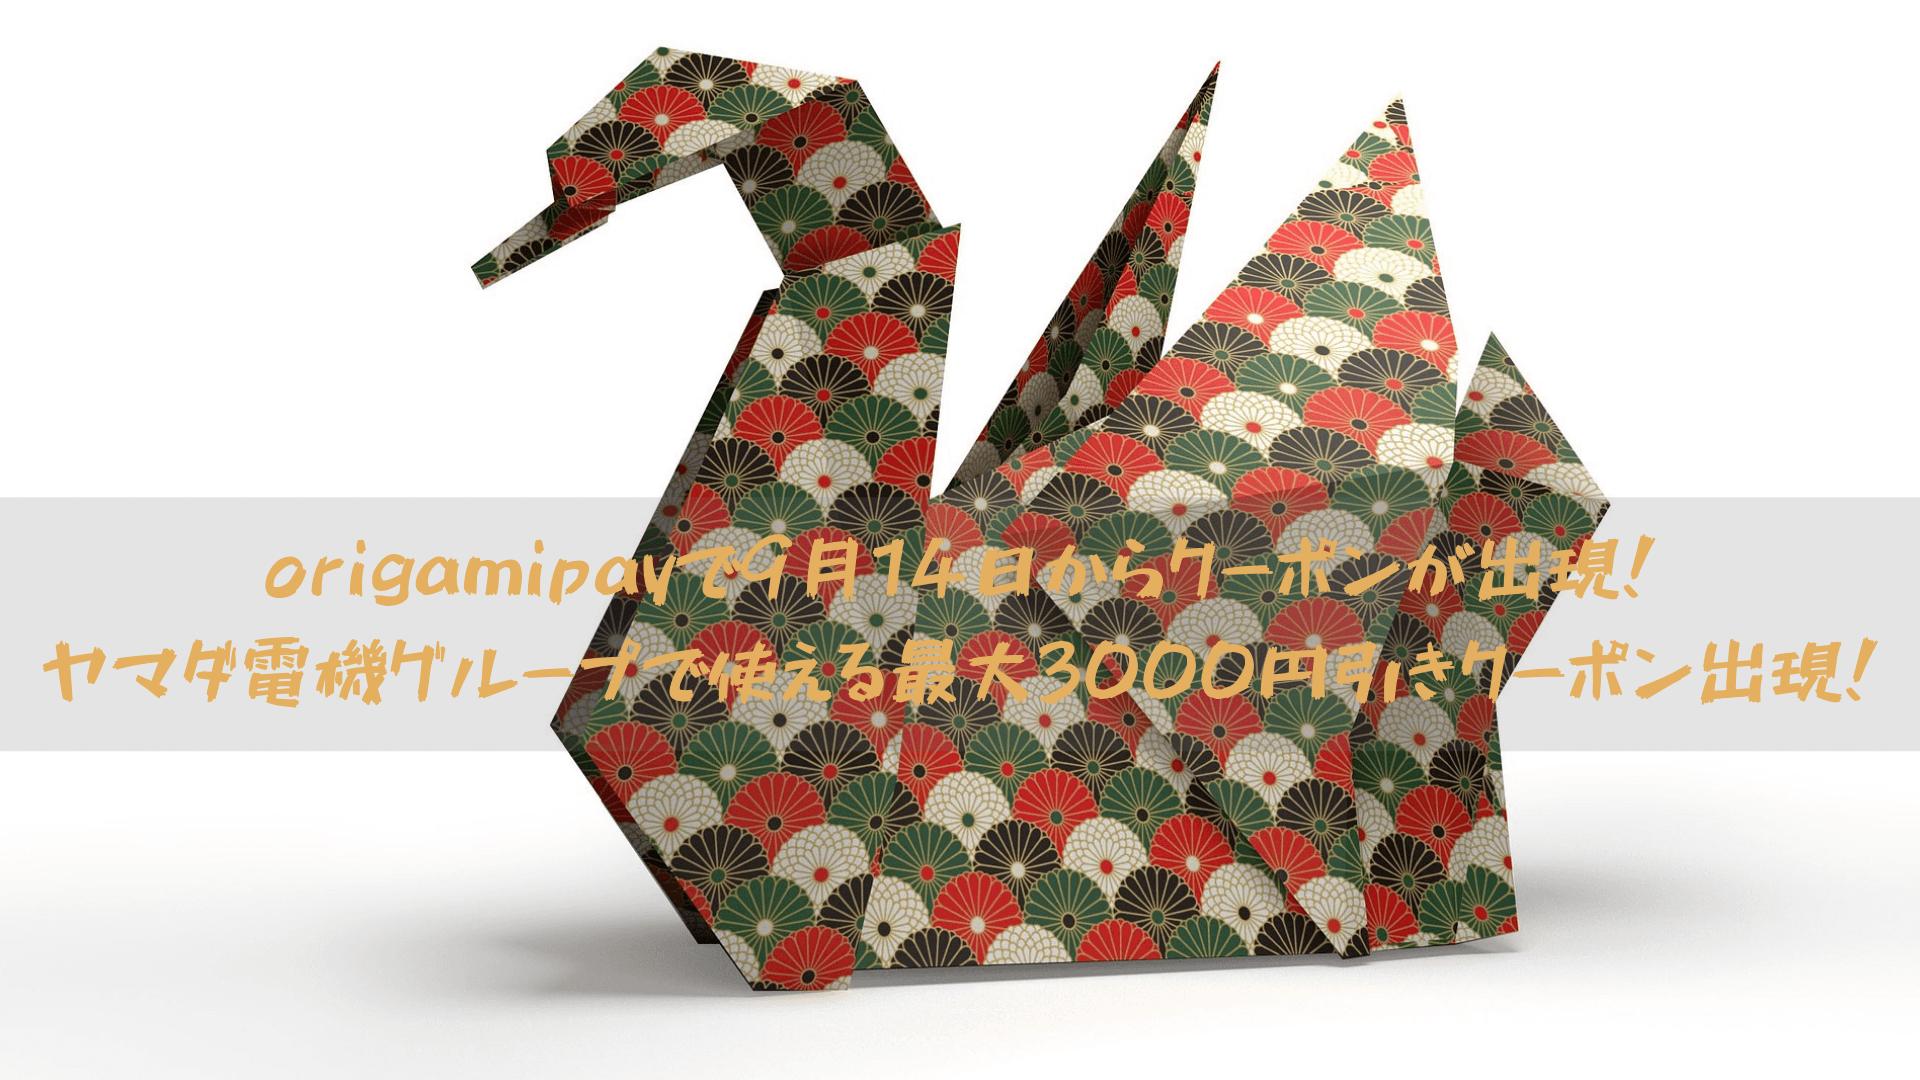 origamipayで9月14日からクーポンが出現!ヤマダ電機グループで使える最大3000円引きクーポン出現!